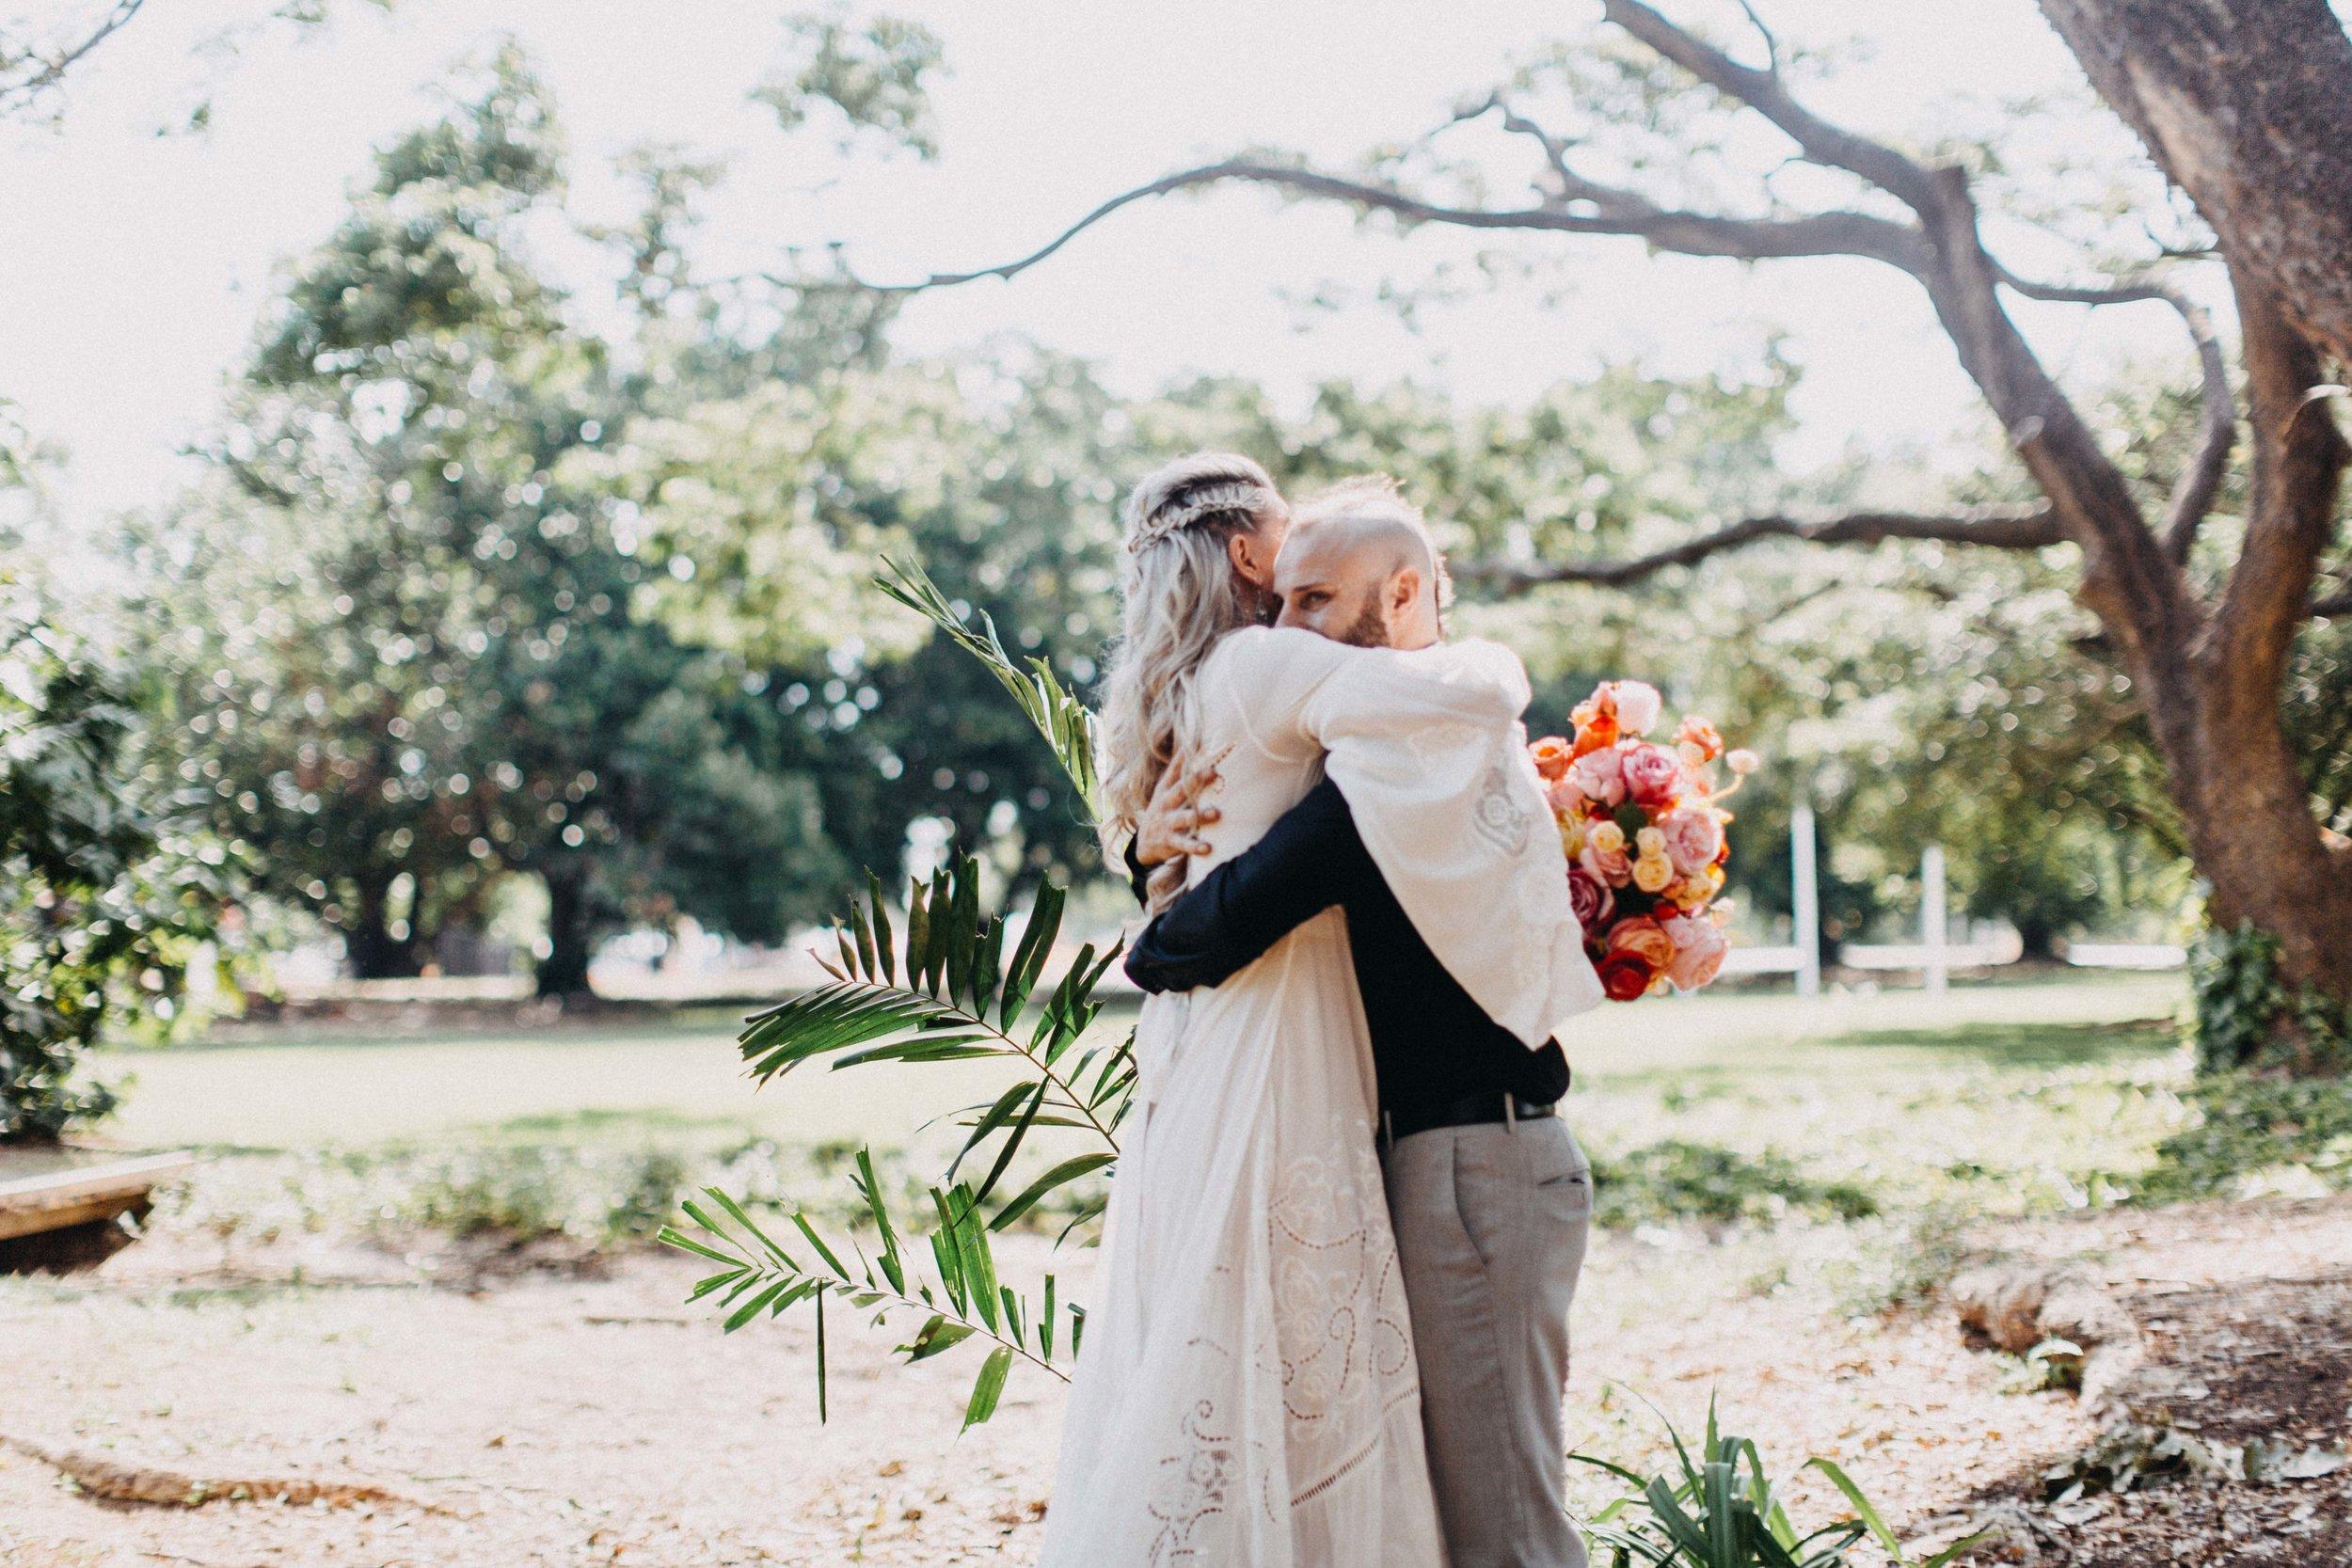 darwin-elopement-wedding-beach-camden-photography-www.emilyobrienphotography.net-6.jpg